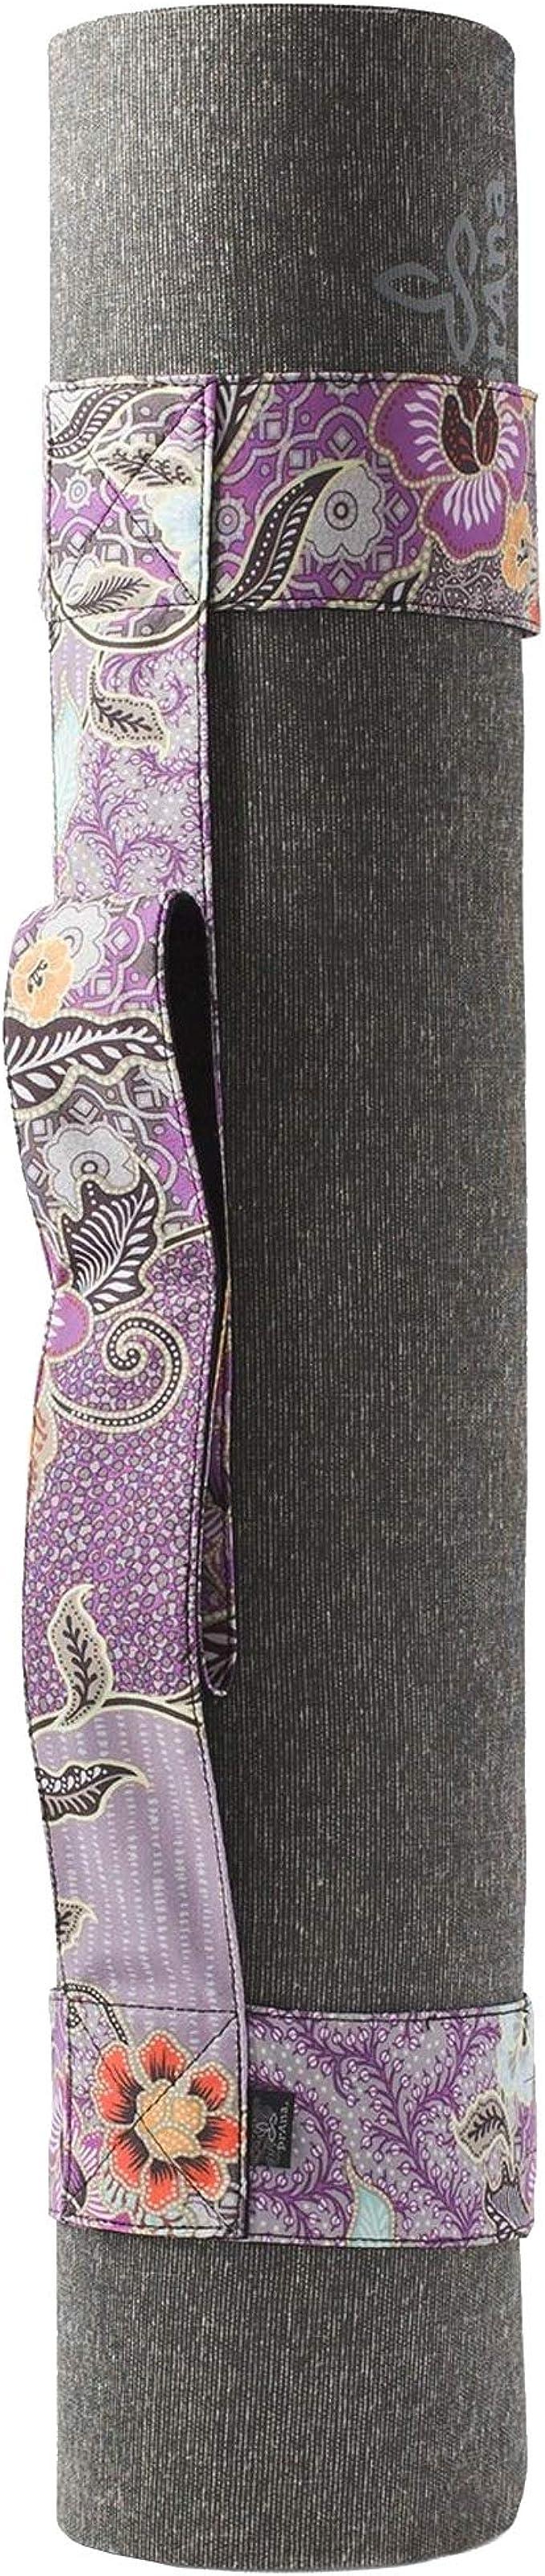 Amazon.com: PrAna - Soporte para alfombra, talla única ...